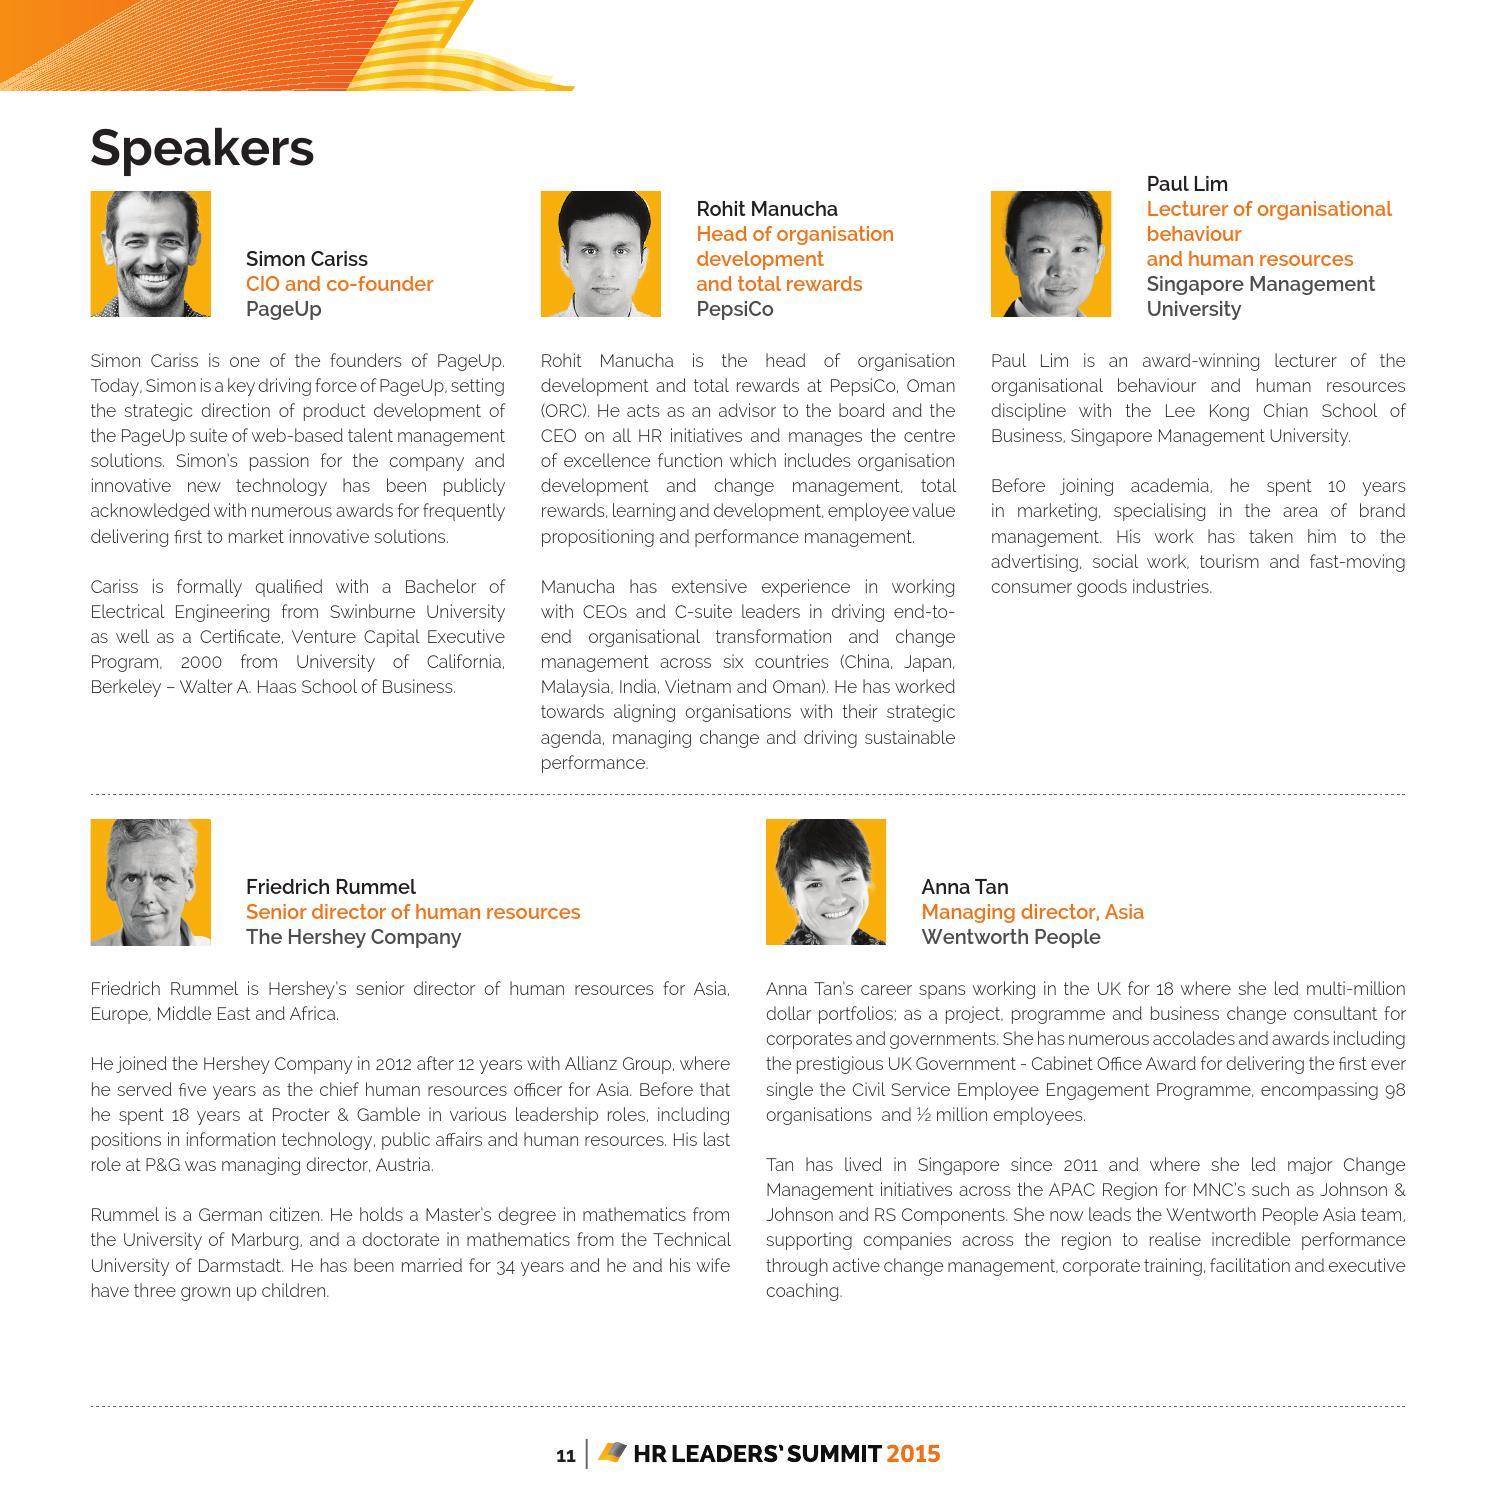 HR Leaders Summit, Phuket 2015 - delegate book by Human